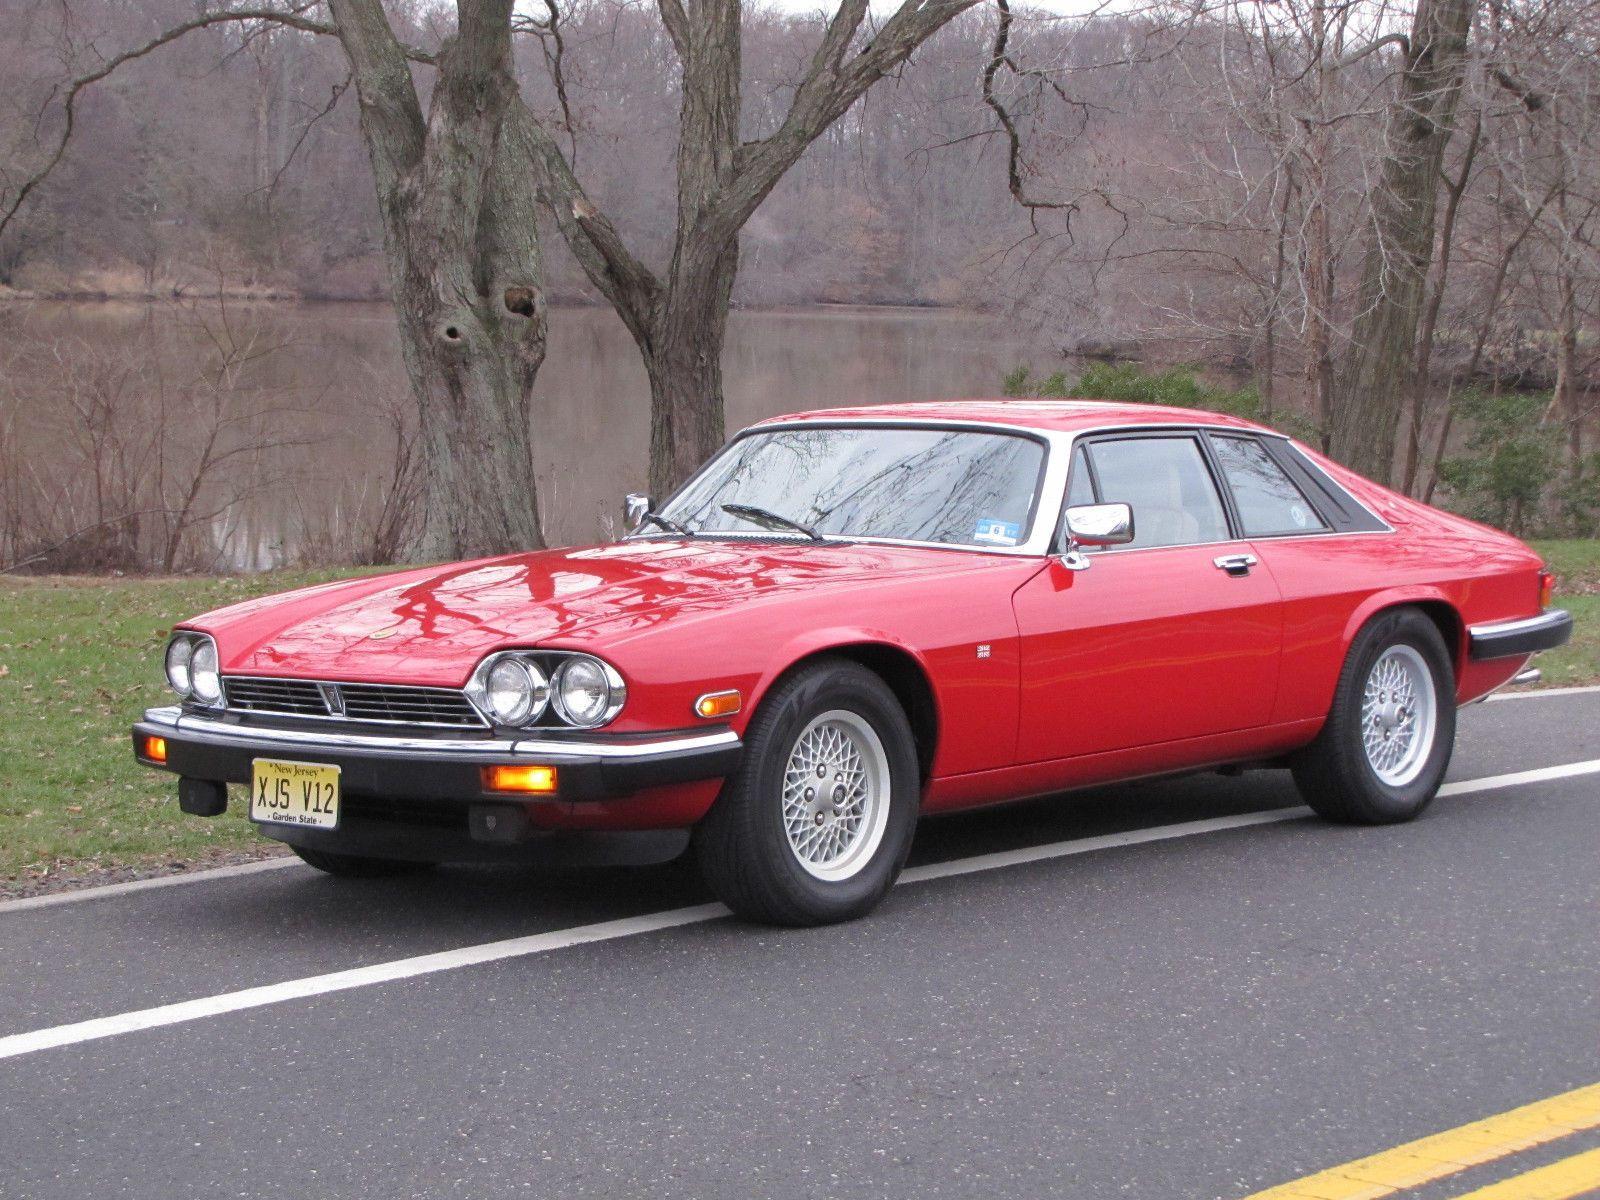 1991 Jaguar XJS Classic Collection   Classic cars, Jaguar car, Jaguar